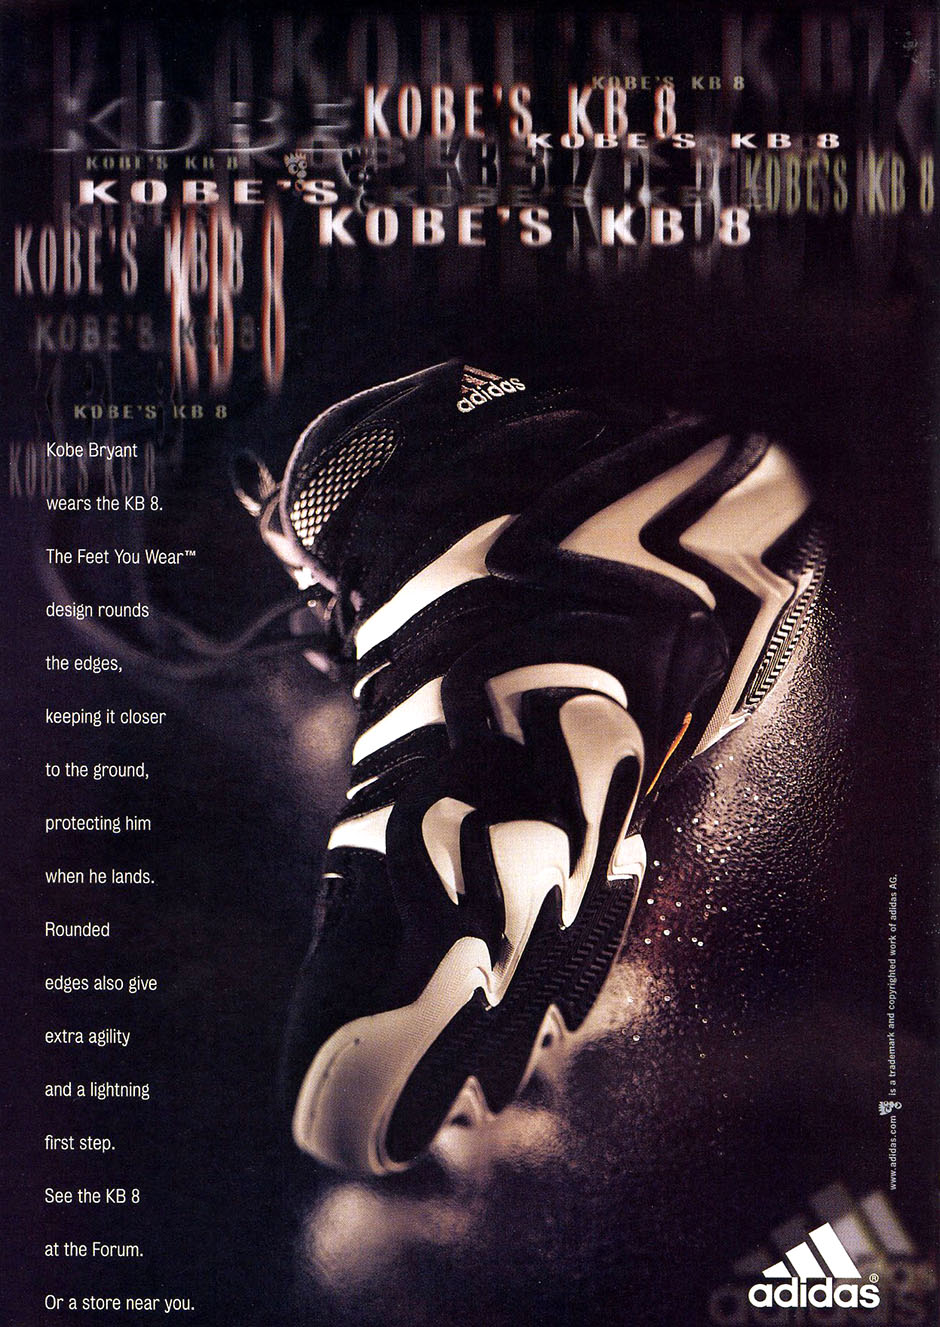 adidas-kb8-ad-2